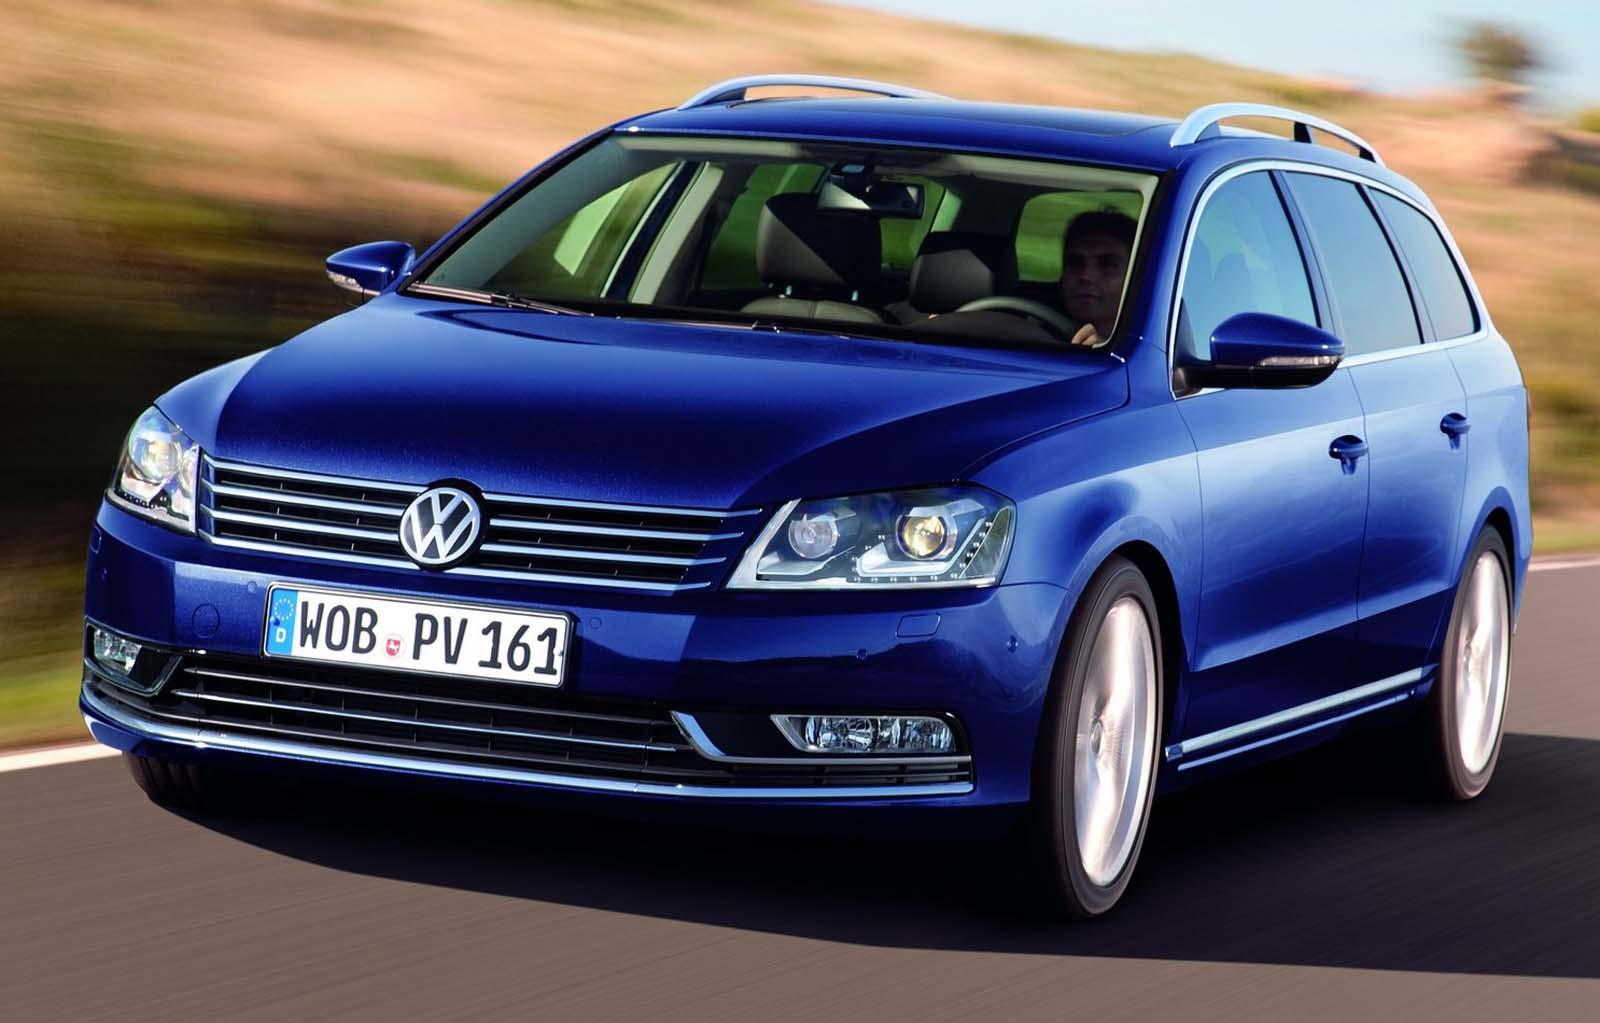 volkswagen passat sw picture 3 reviews news specs buy car. Black Bedroom Furniture Sets. Home Design Ideas